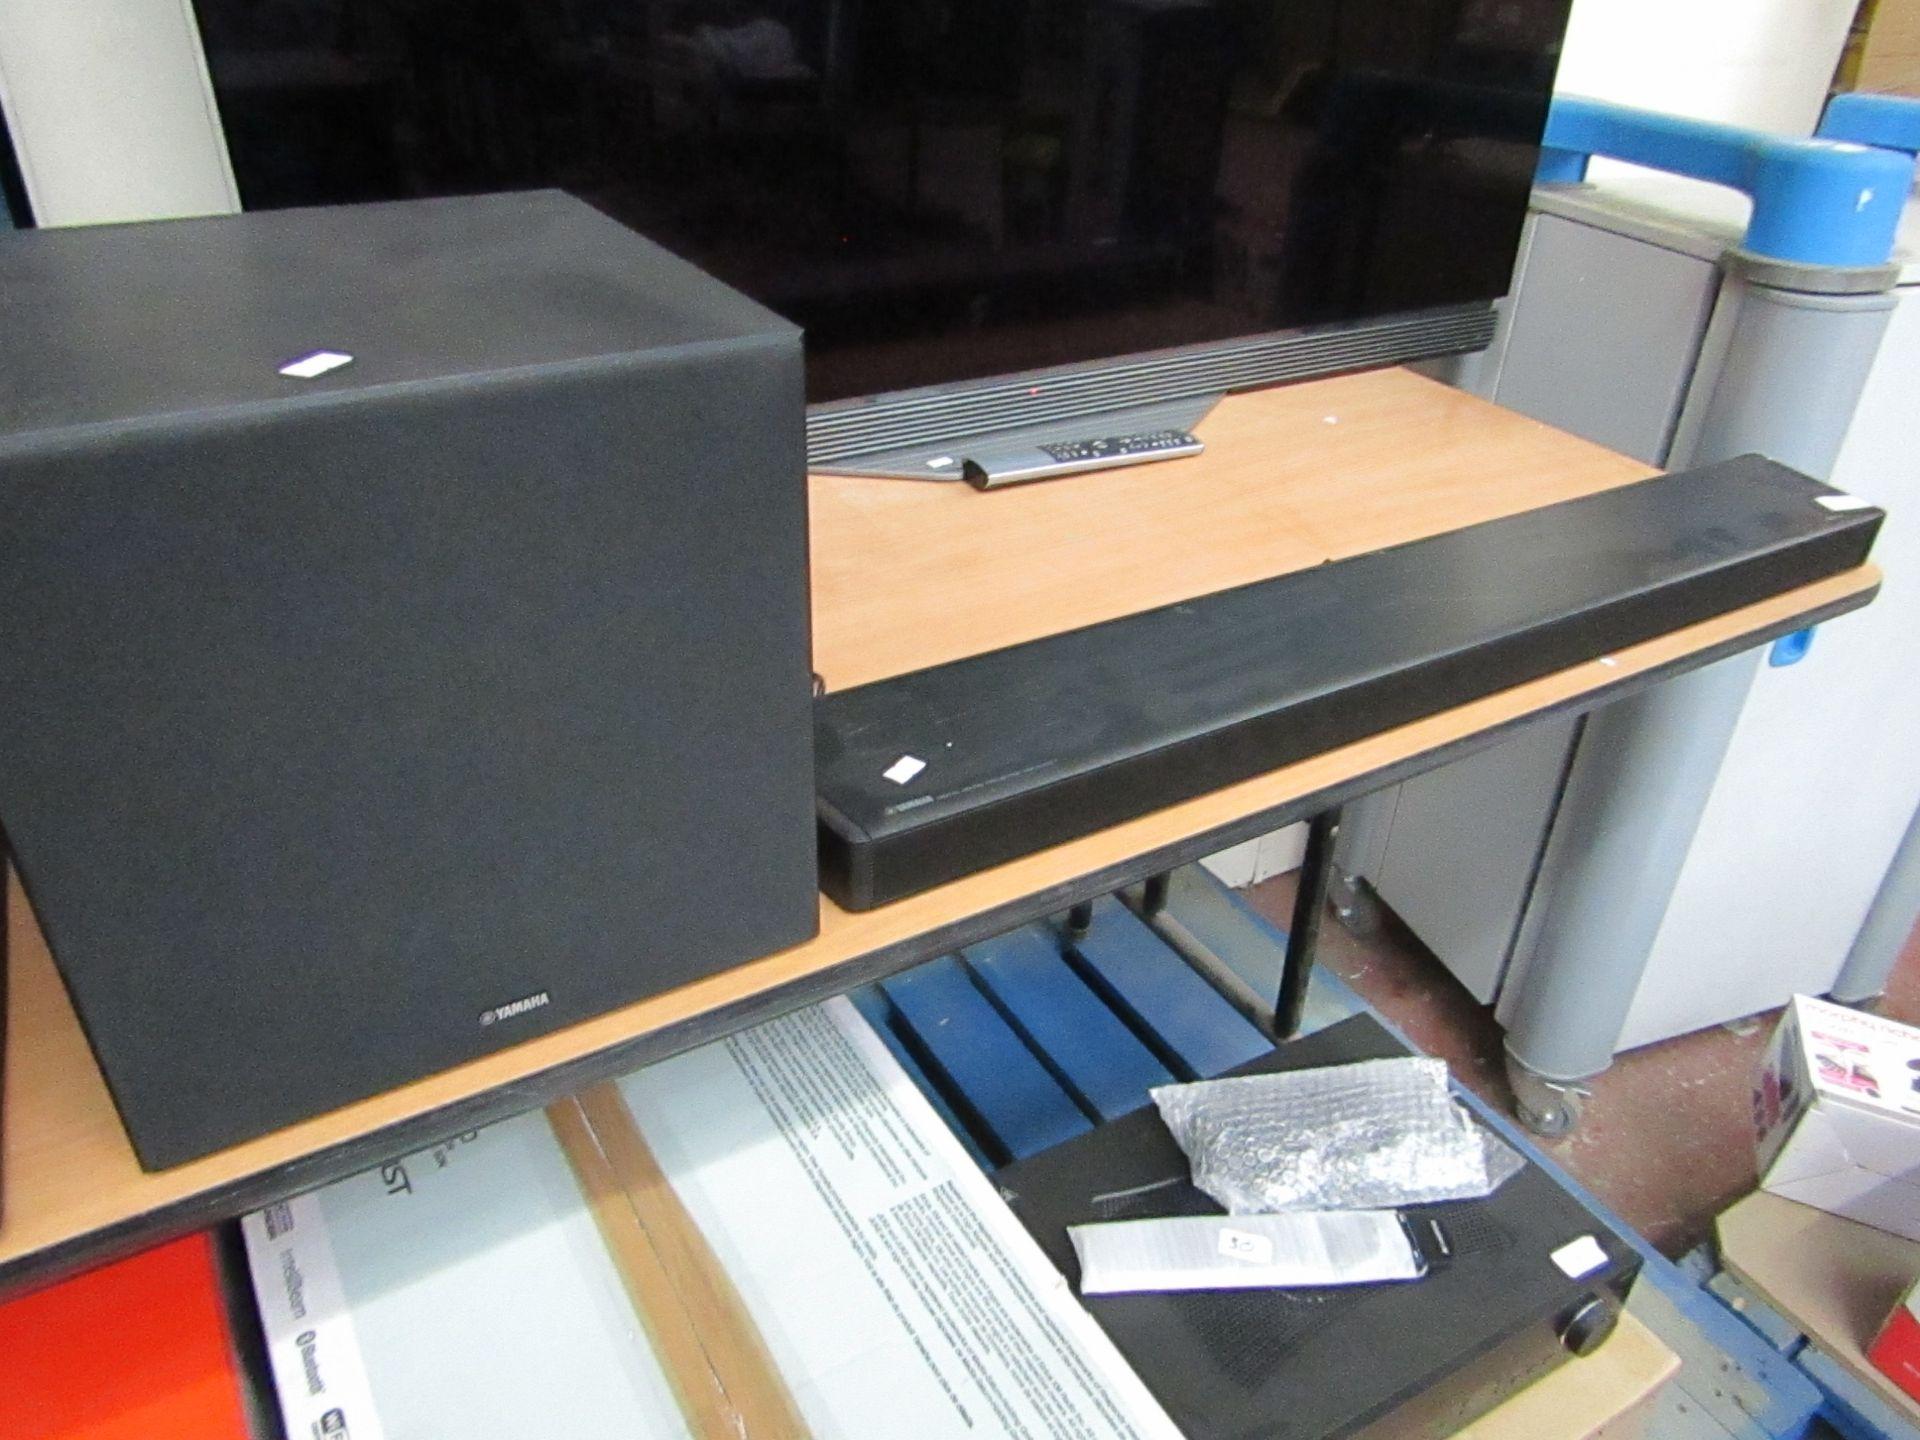 Lot 87 - Yamaha Ysp-2700 Digital Sound Projector - Soundbar plus Subwoofer £549.00, with original box